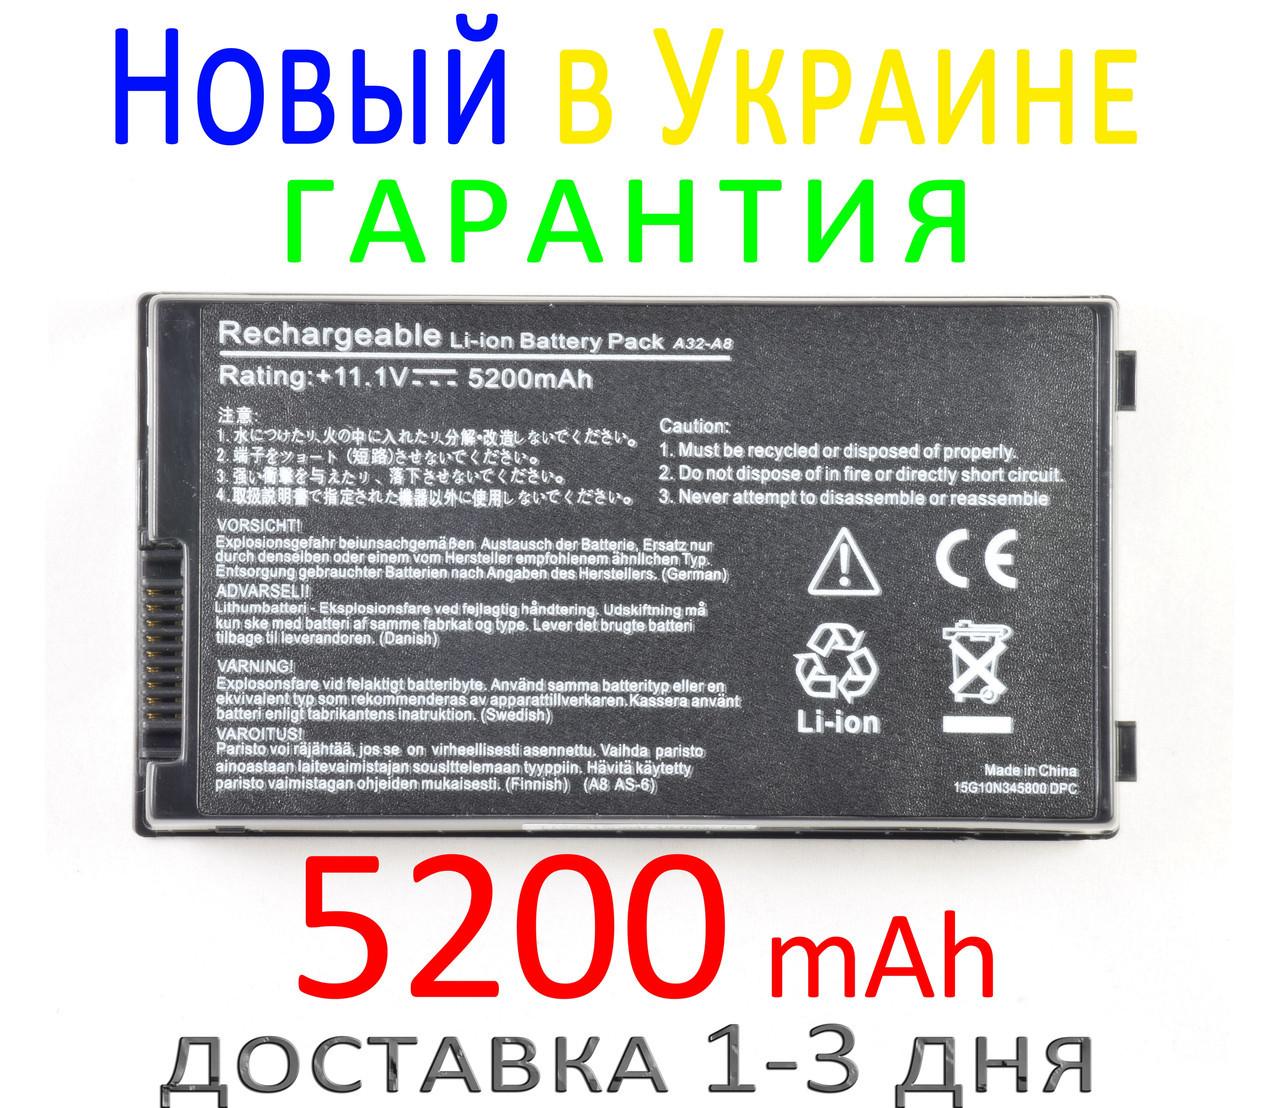 Аккумулятор батарея Asus A8 He J Ja Jc Je Jm Jn